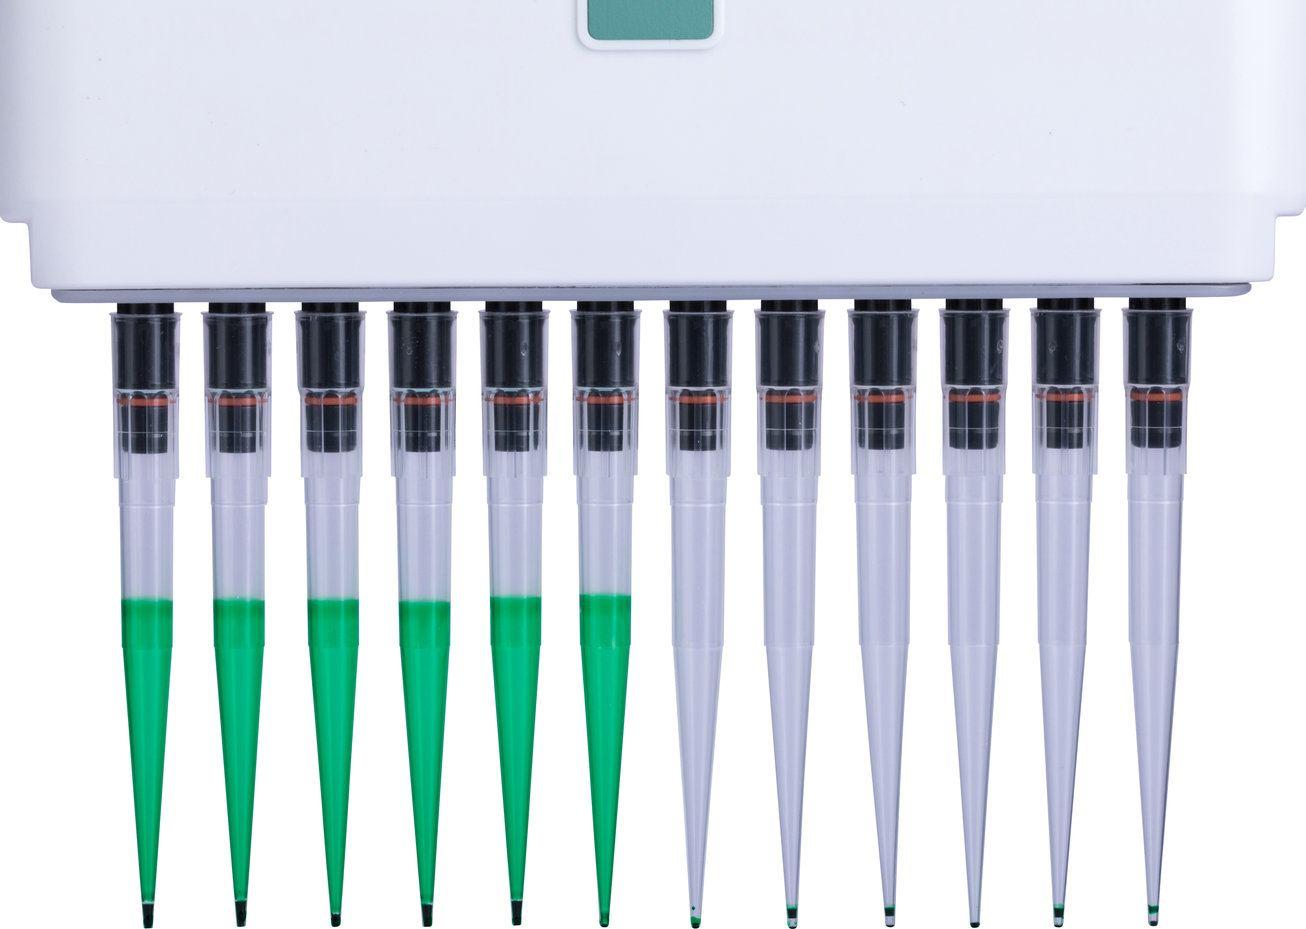 Standard GripTips x6 (L) vs Low Retention GripTips x6 (R)